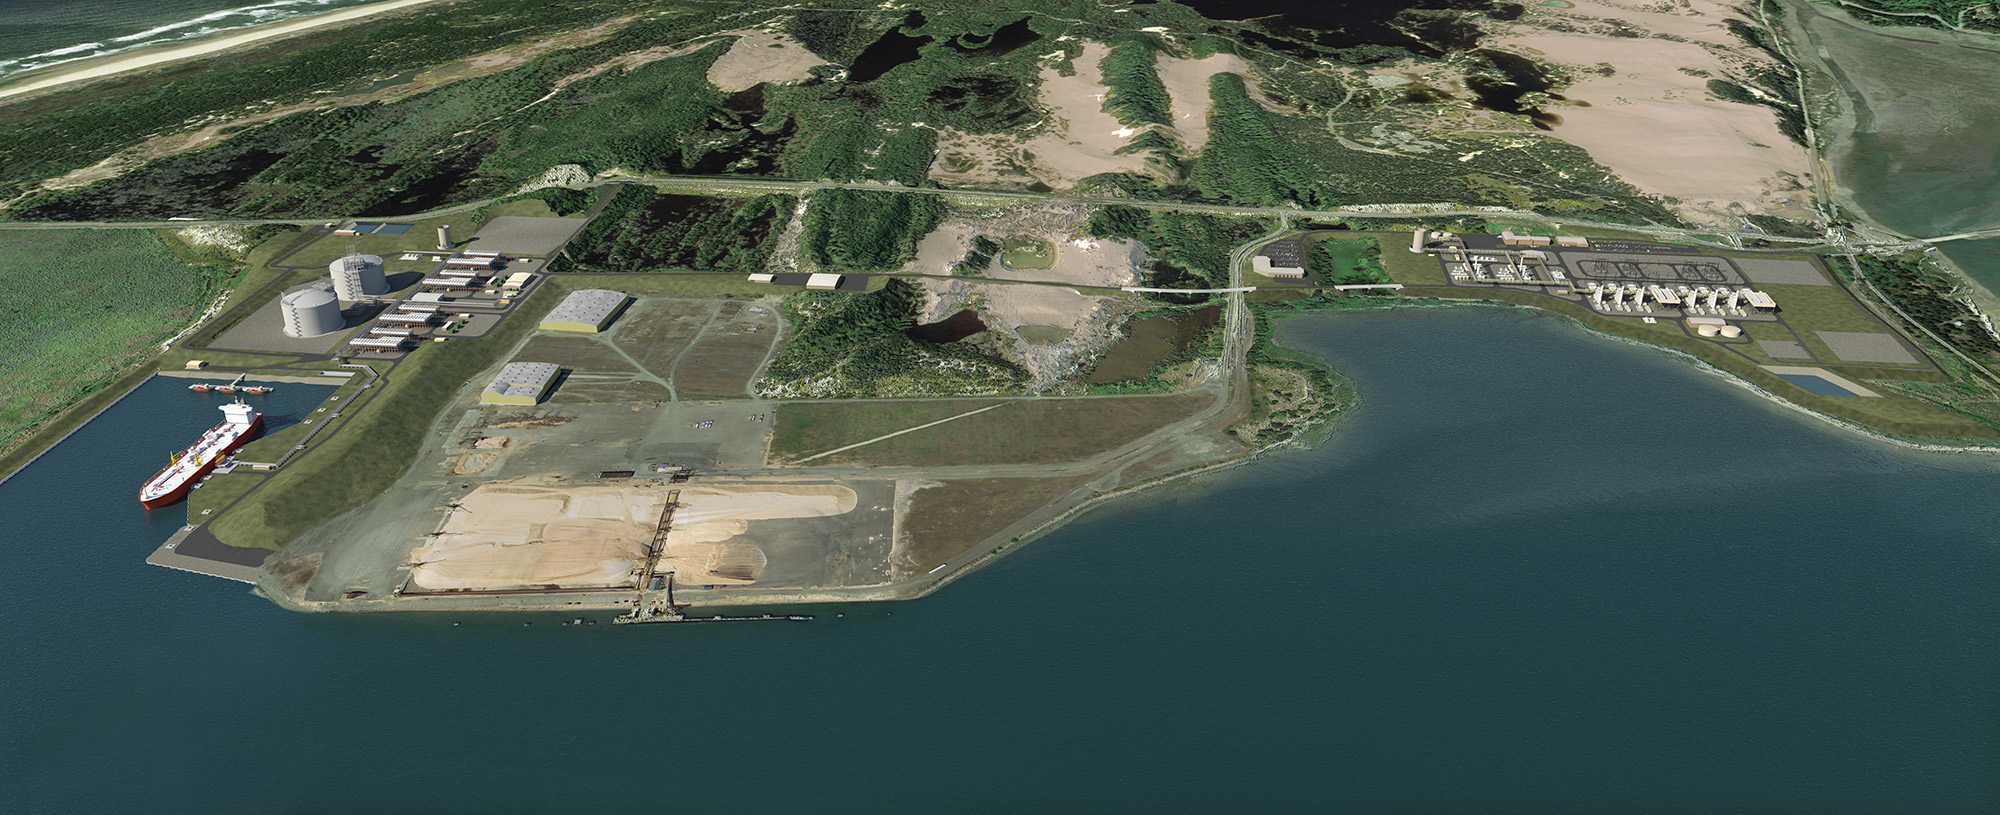 Jordan-Cove-Overall-Aerial-View_2000x815_v4.jpg